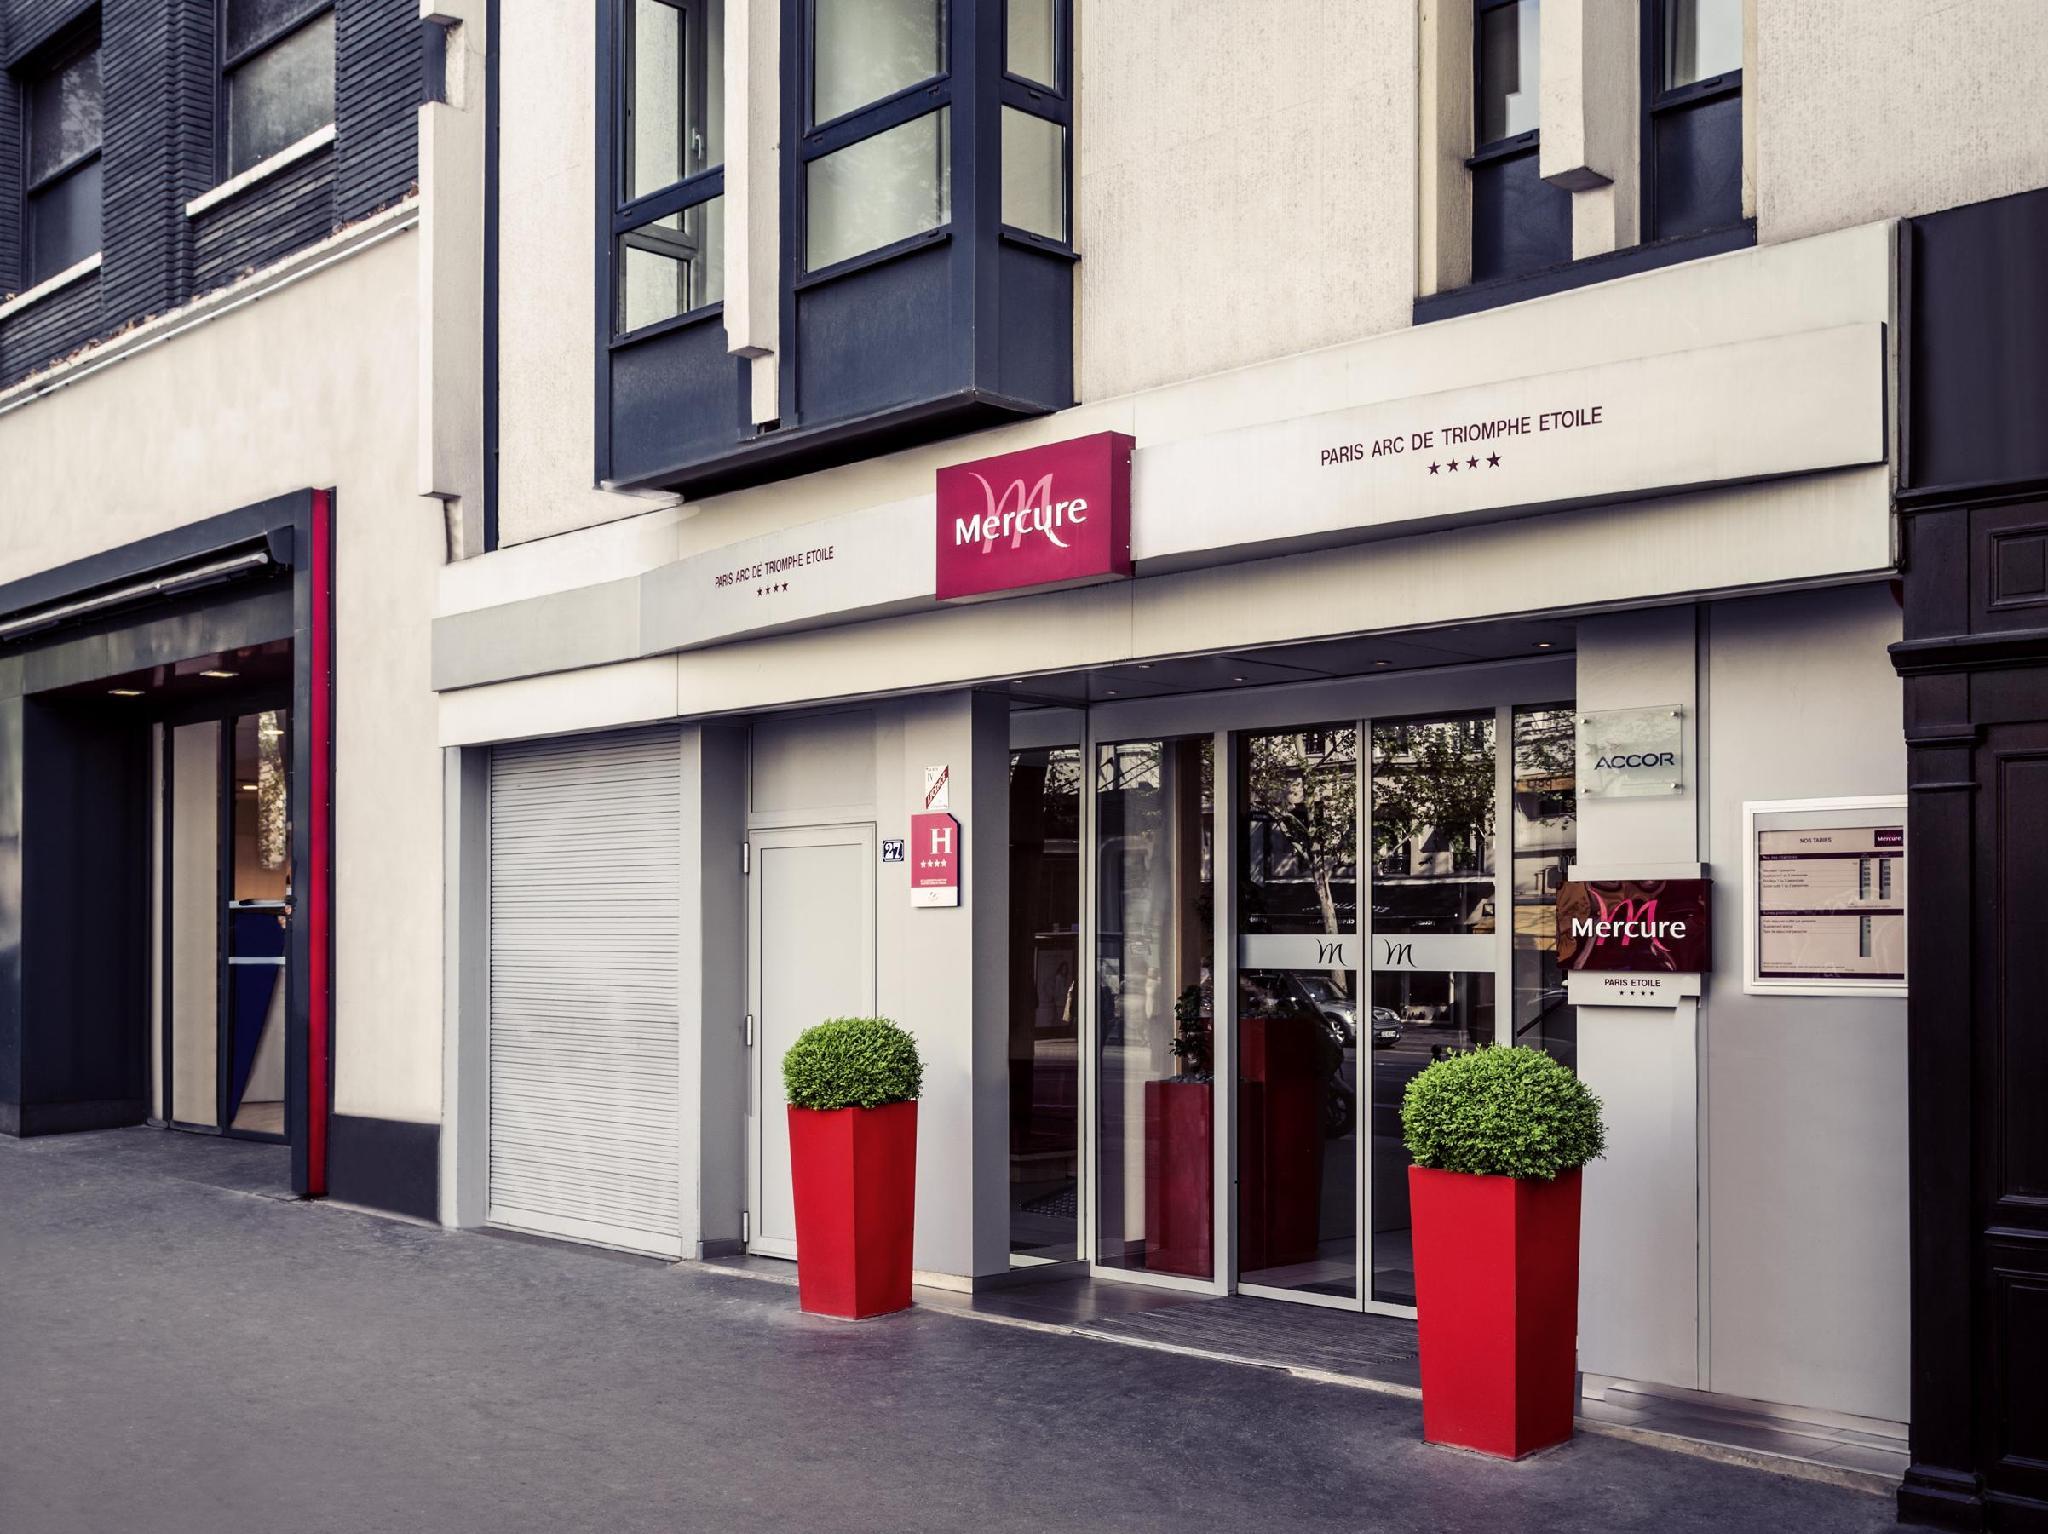 Mercure Paris Arc de Triomphe Etoile Hotel - Hotell och Boende i Frankrike i Europa